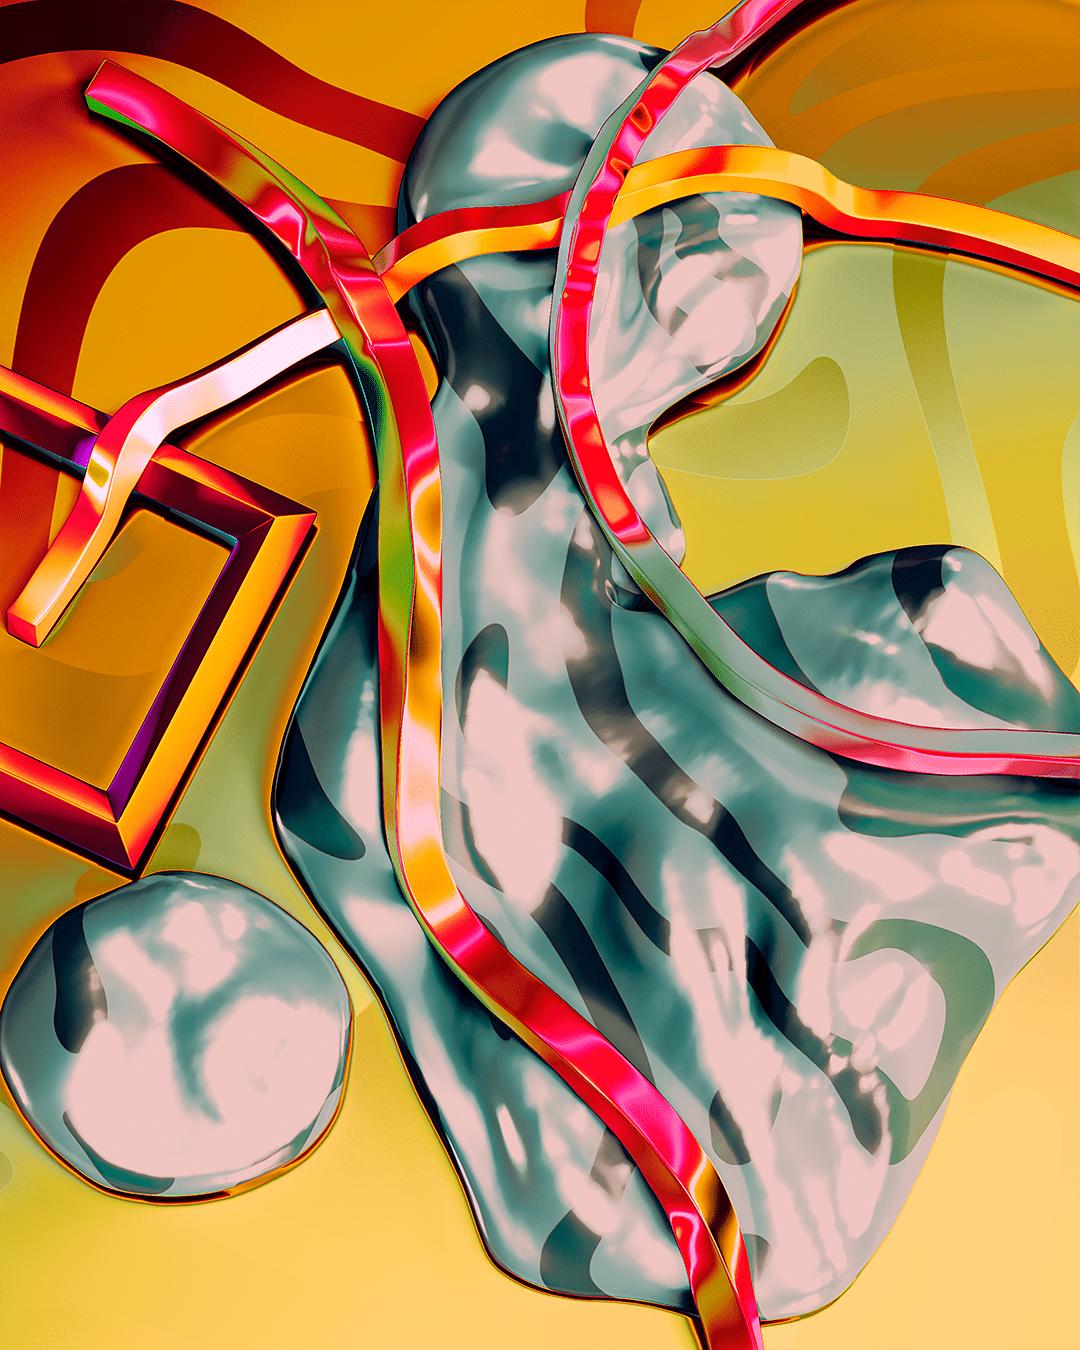 Neon metallic colors